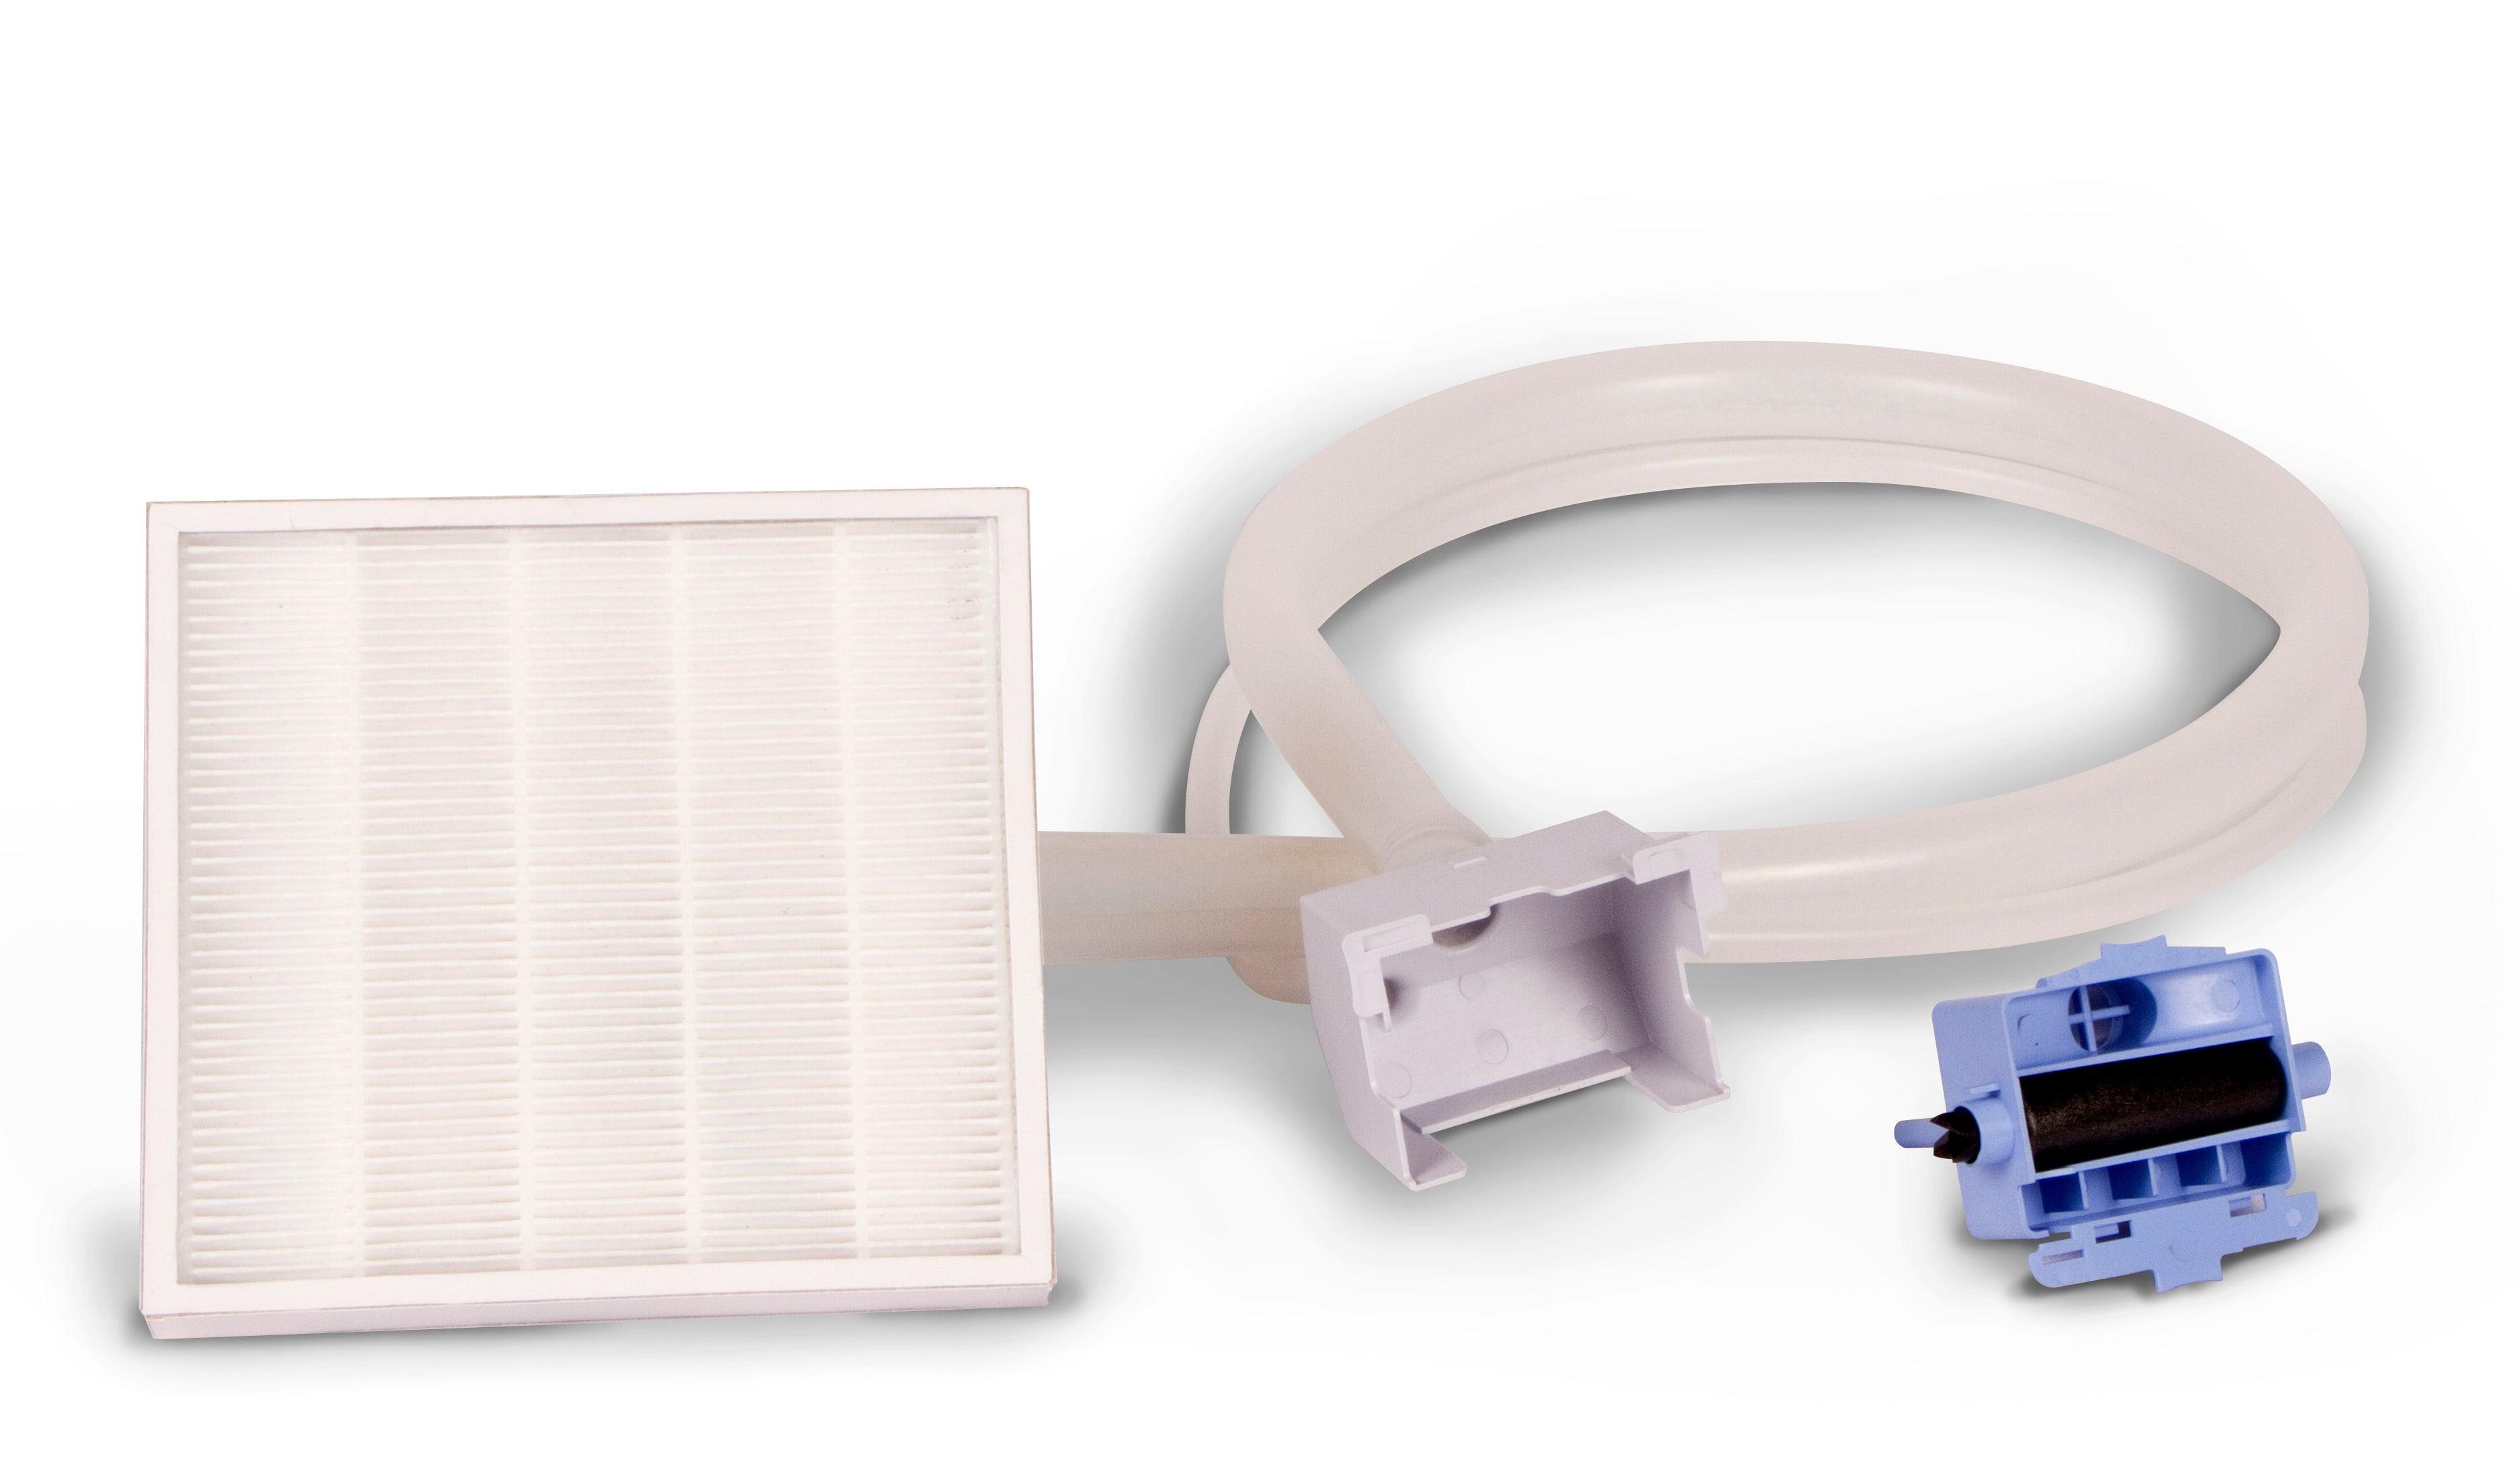 2044314-HP-Kit-manutenzione-inchiostro-Latex-792-HP-792-Kit-di-manutenzione